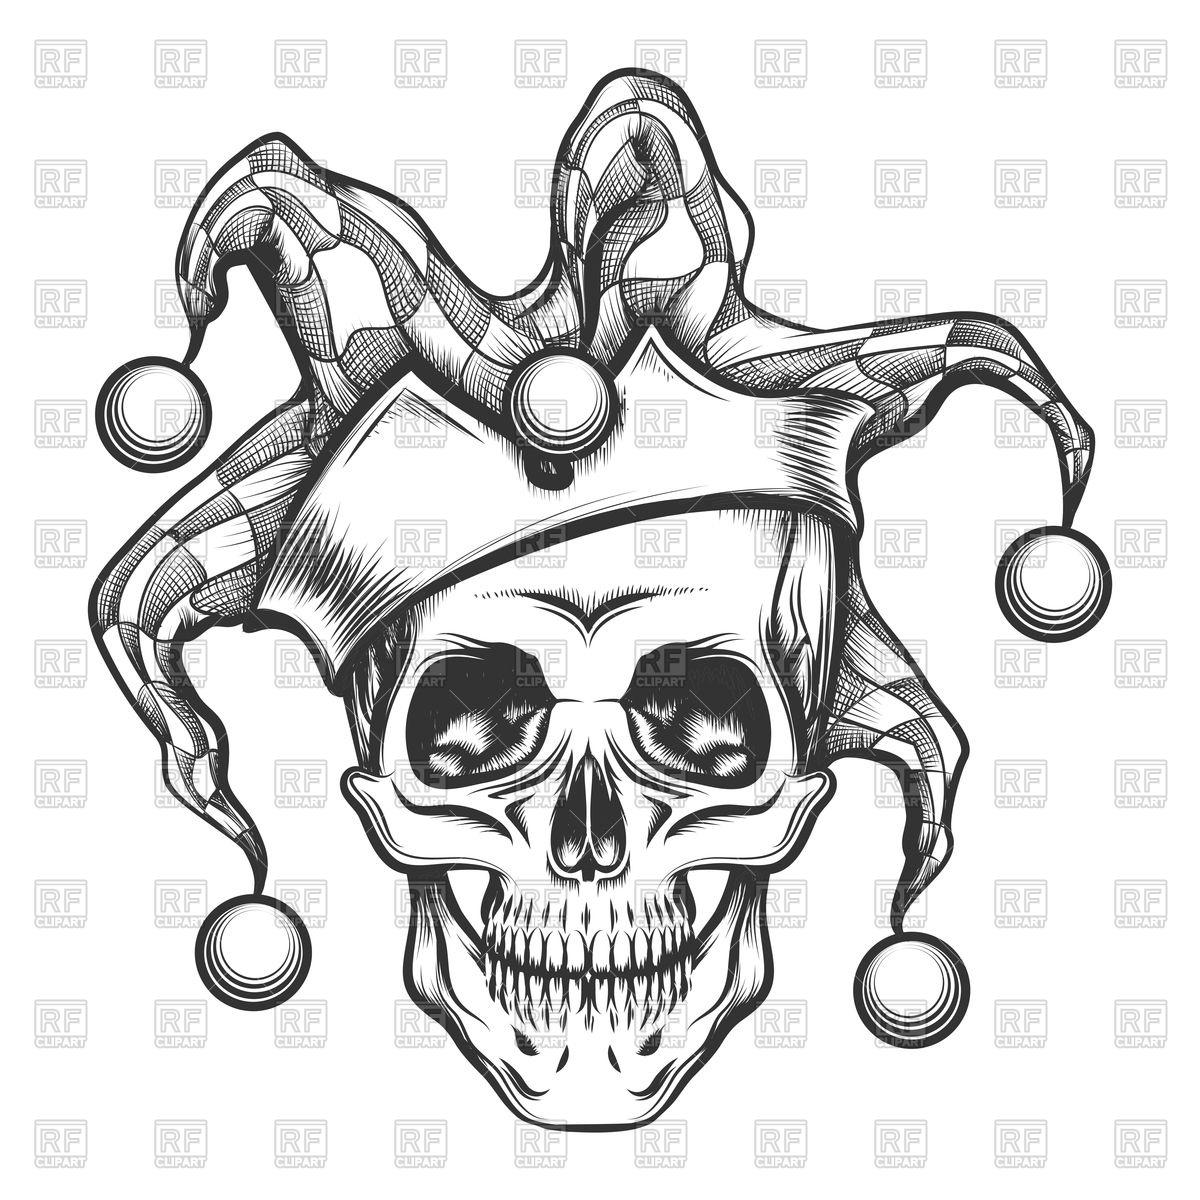 1200x1200 Hand Drawn Jester Skull In Fools Cap Royalty Free Vector Clip Art